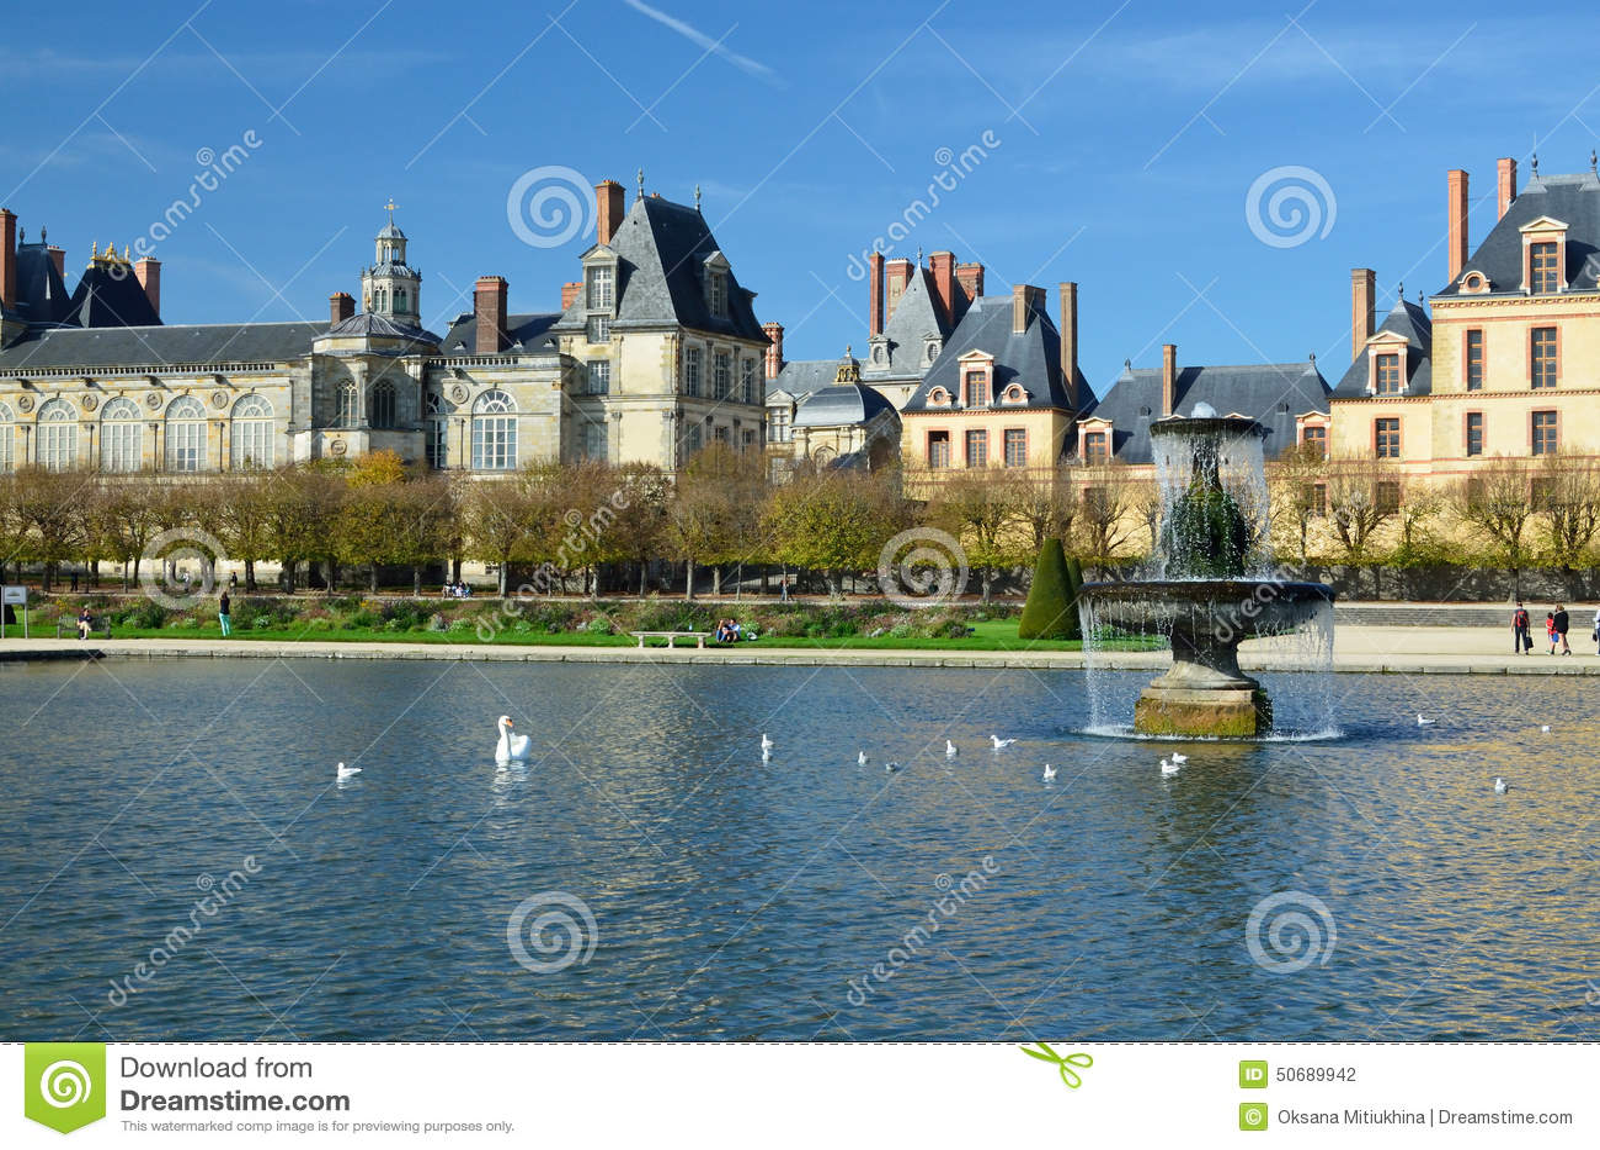 Download 枫丹白露著名宫殿 库存照片. 图片 包括有 纪念碑, 新生, 喷泉, 视图, 枫丹白露, 欧洲, 宫殿, 城堡 - 50689942